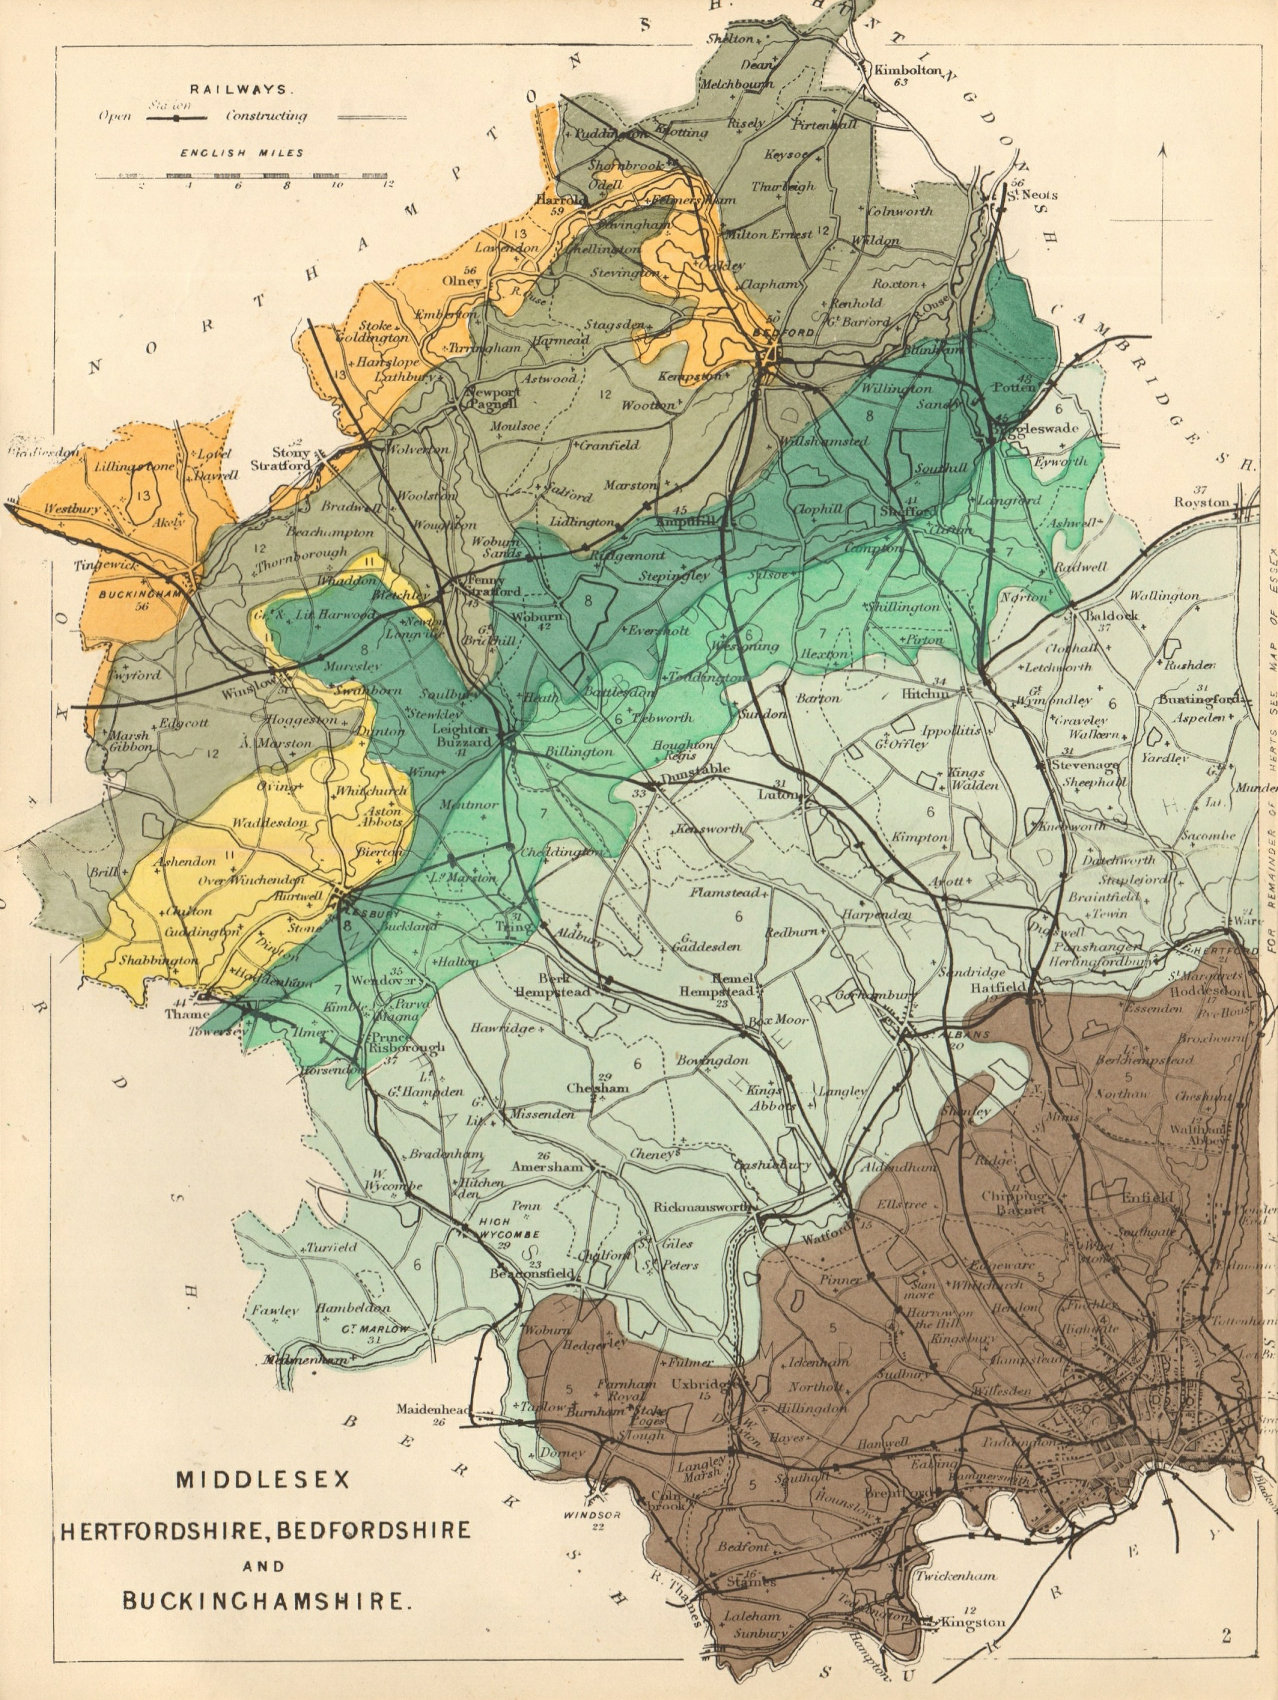 MIDDX HERTFORDSHIRE BEDFORDSHIRE BUCKINGHAMSHIRE geological map. REYNOLDS 1864